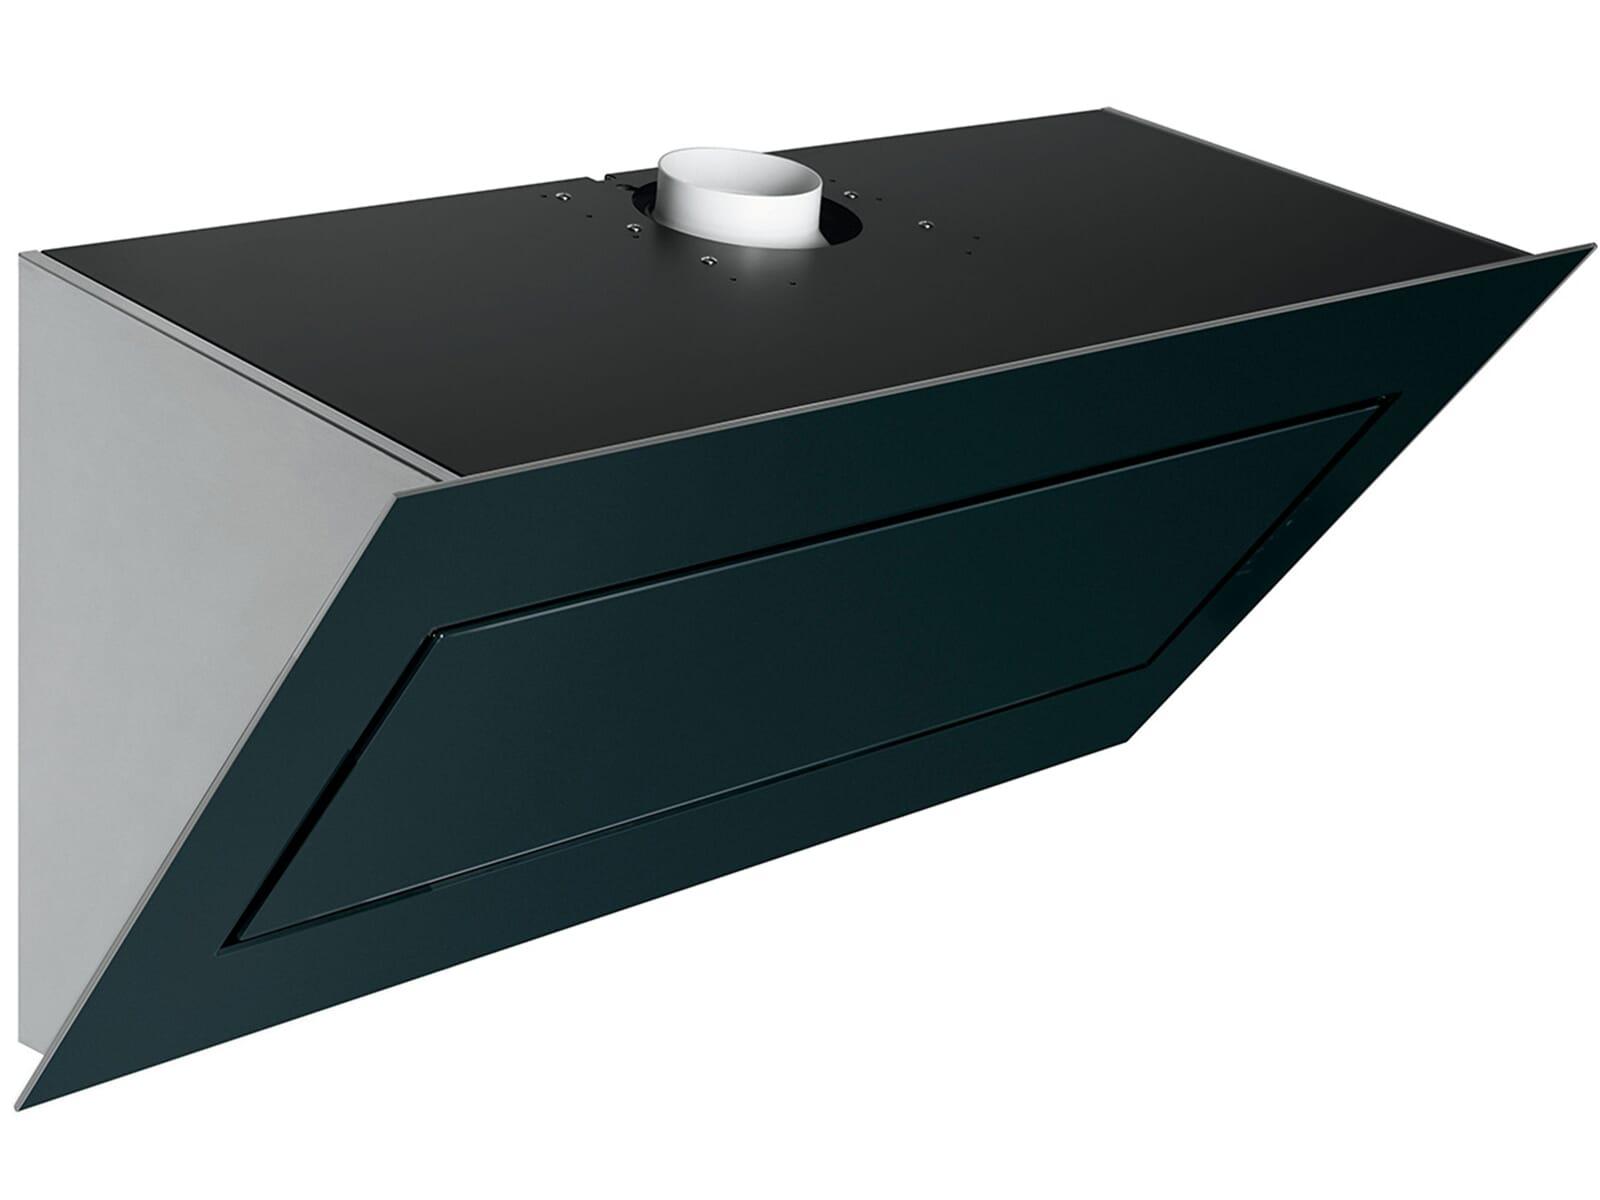 falmec quasar kopffreihaube schwarz. Black Bedroom Furniture Sets. Home Design Ideas